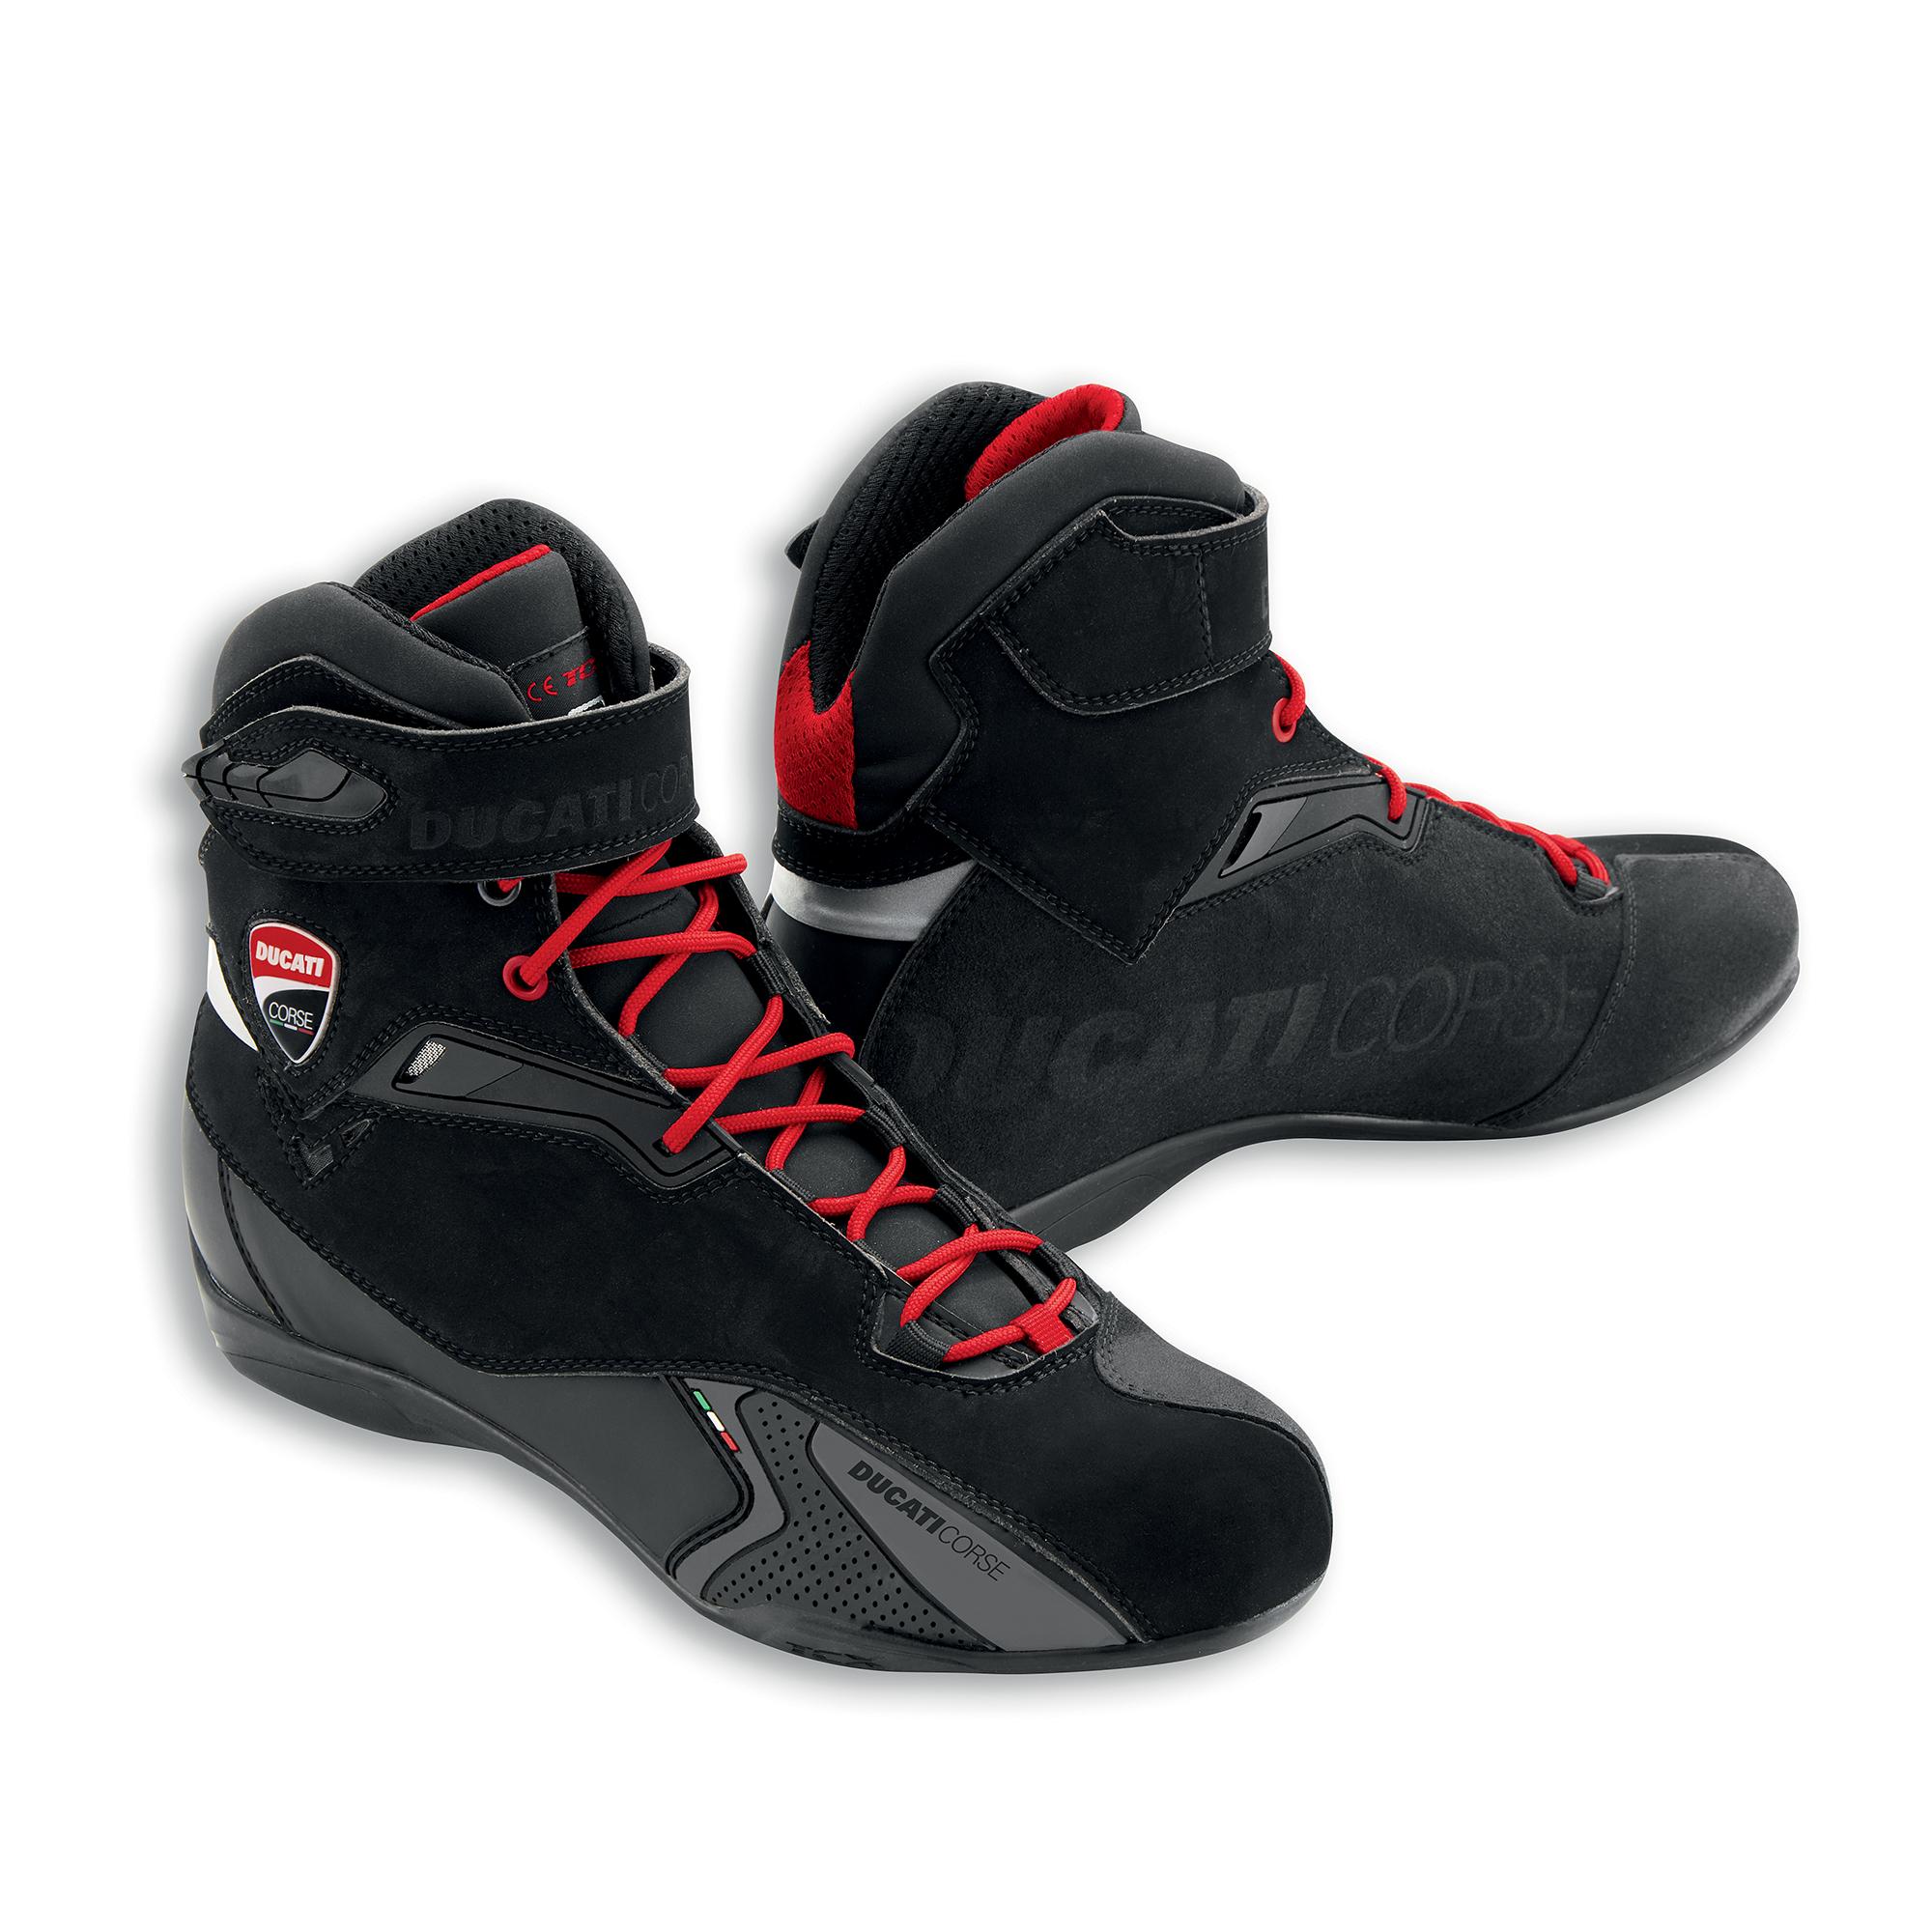 Ducati Corse City Technical shoes 981038537